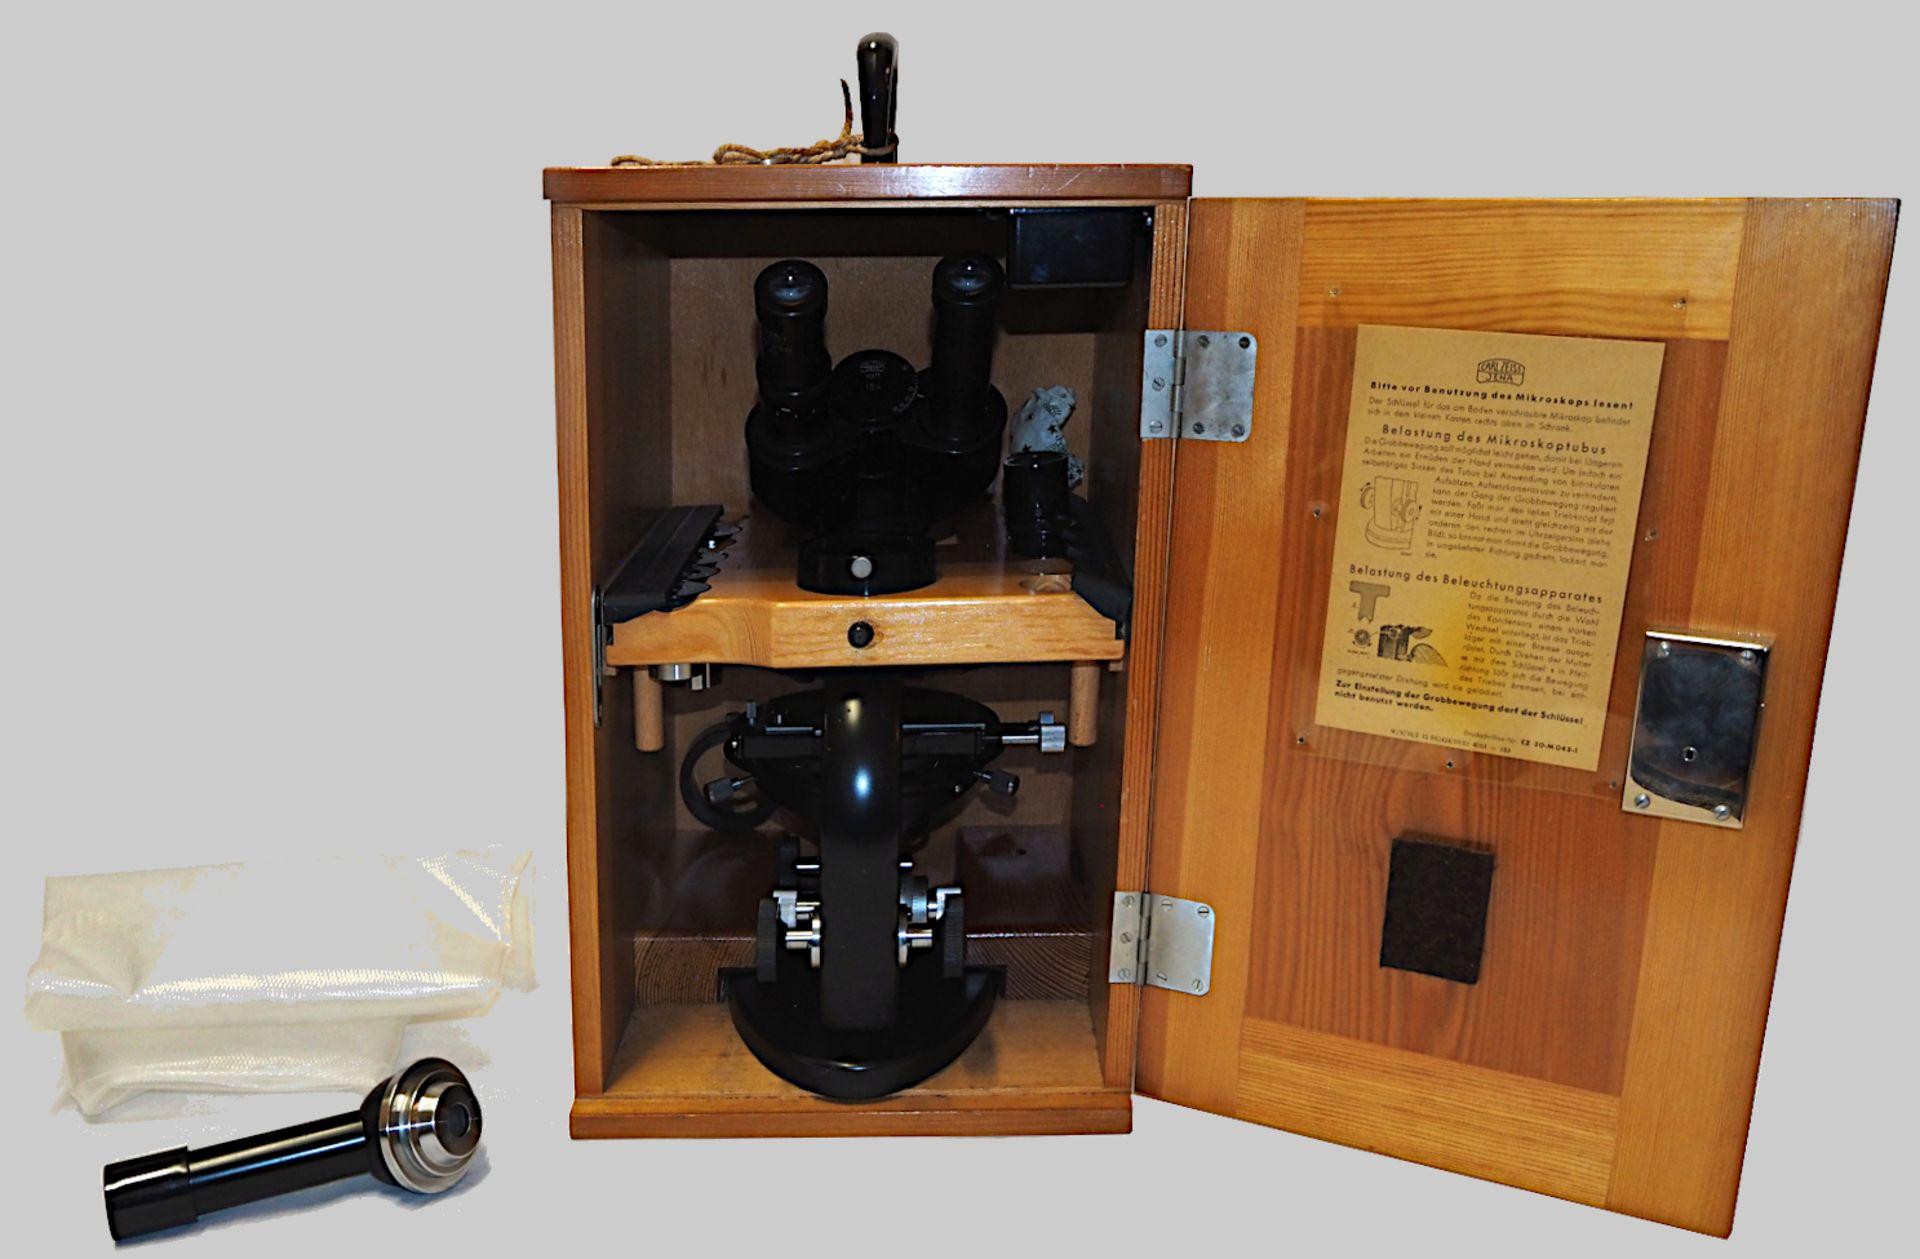 "1 Mikroskop CARL ZEISS, Jena, Modellnummer: ""351510"" schwarz, mit doppeltem Okular, Ei - Bild 2 aus 2"